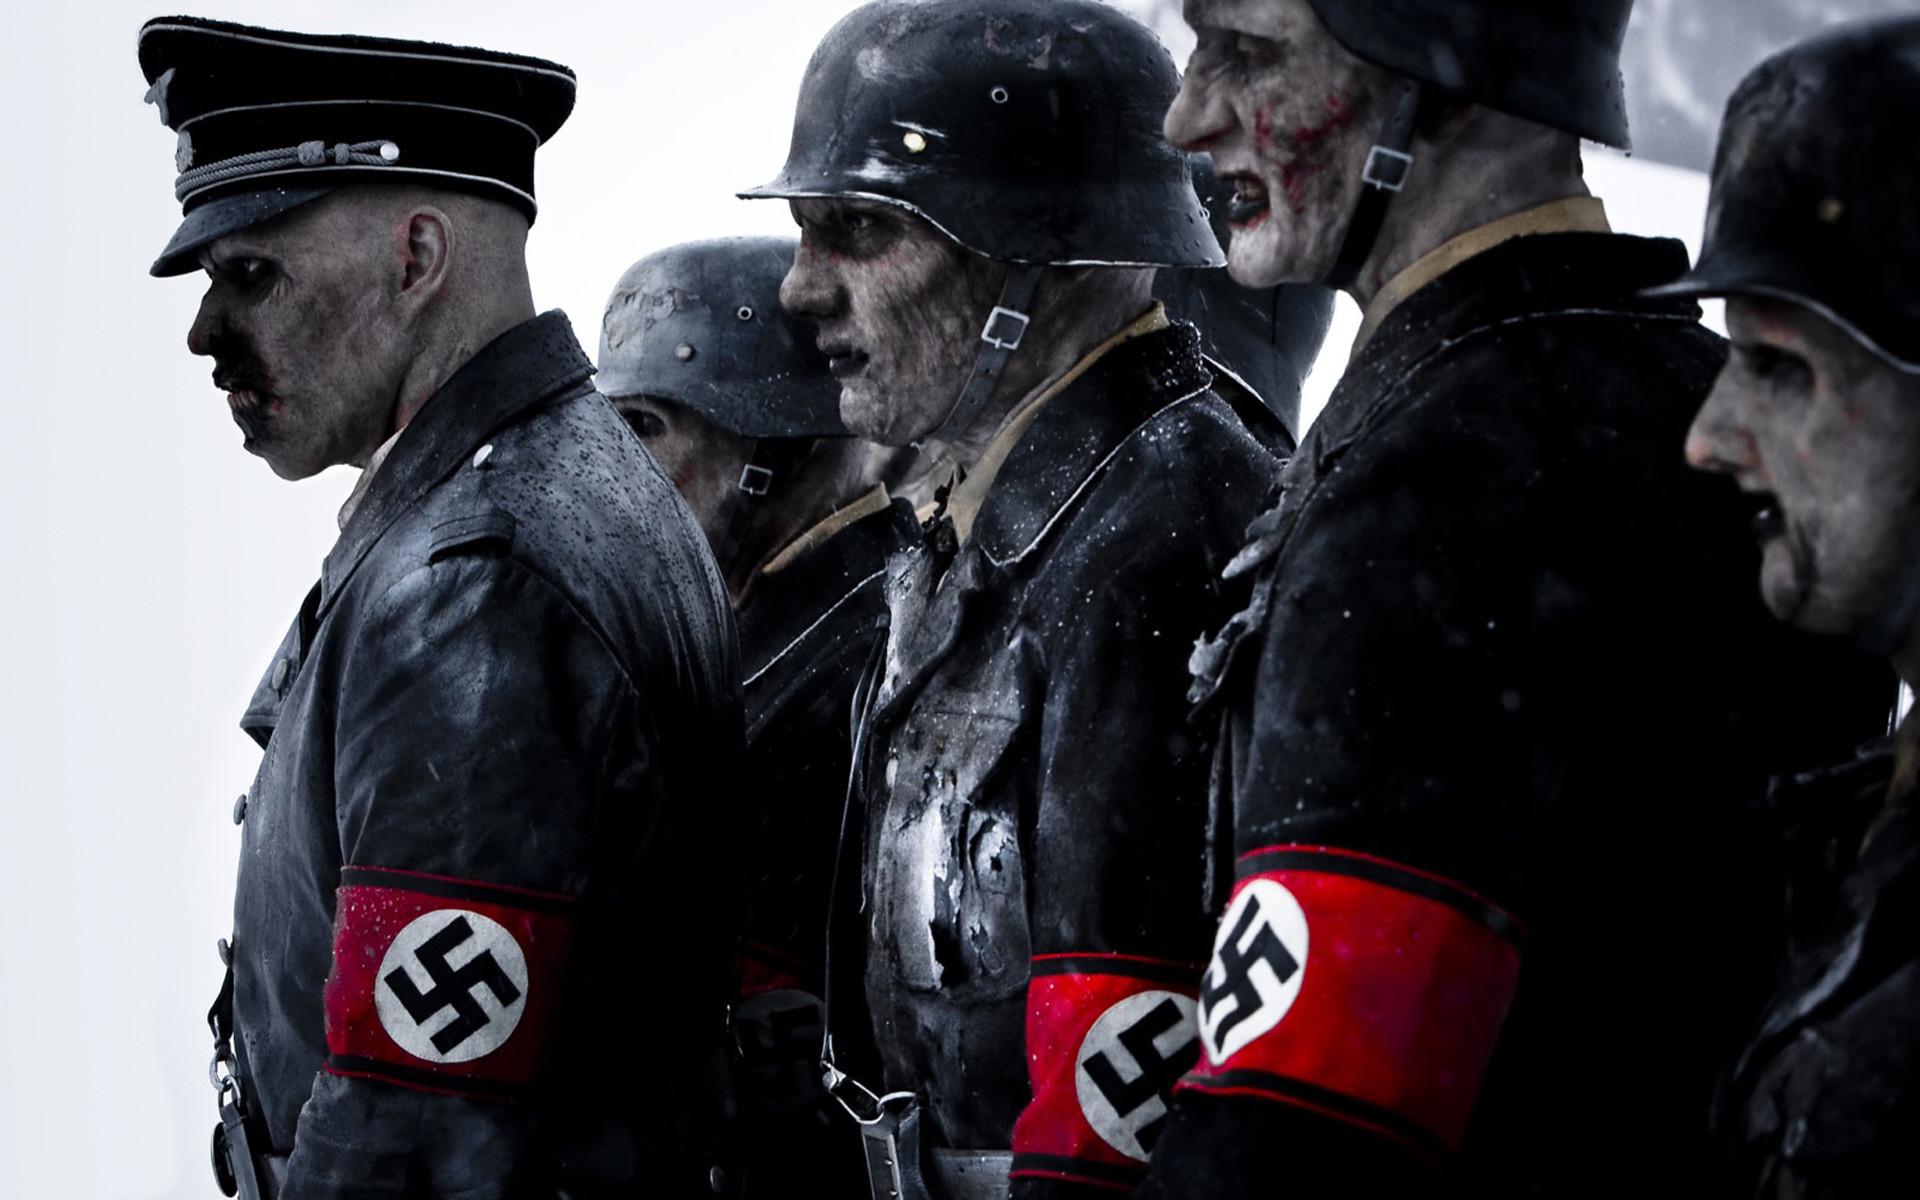 Nazi zombie wallpaper 82 images 1920x1080 nazi zombies 1920x1080 download voltagebd Images